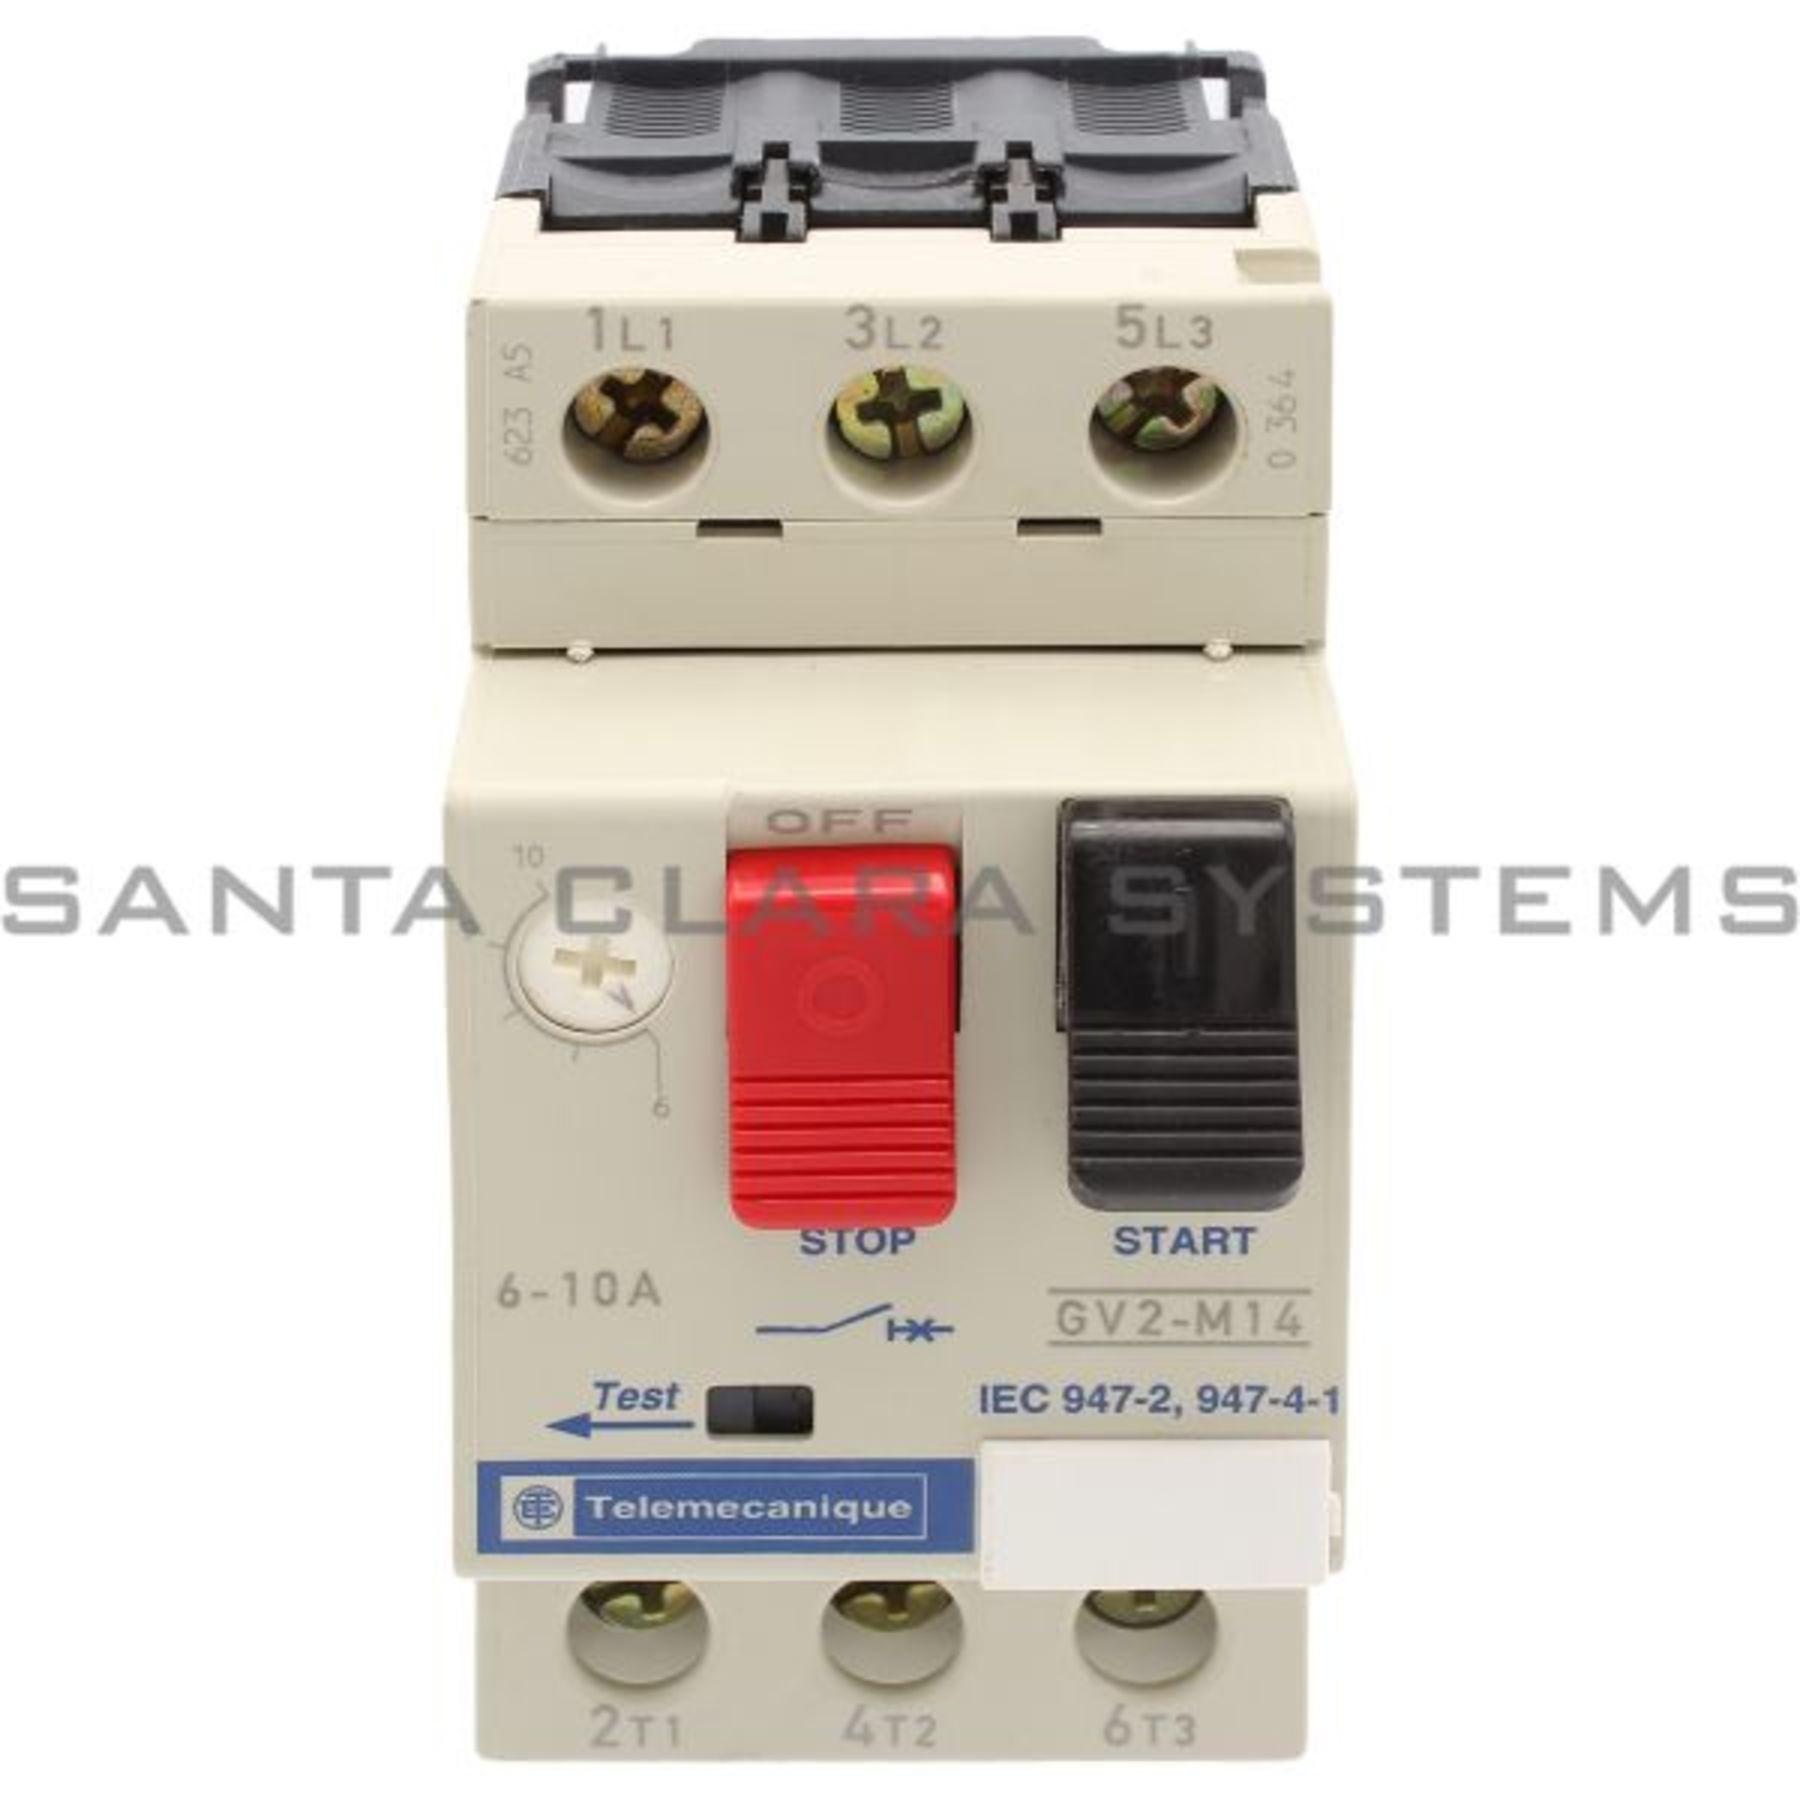 Telemecanique GV2M14 Industrial Control System for sale online